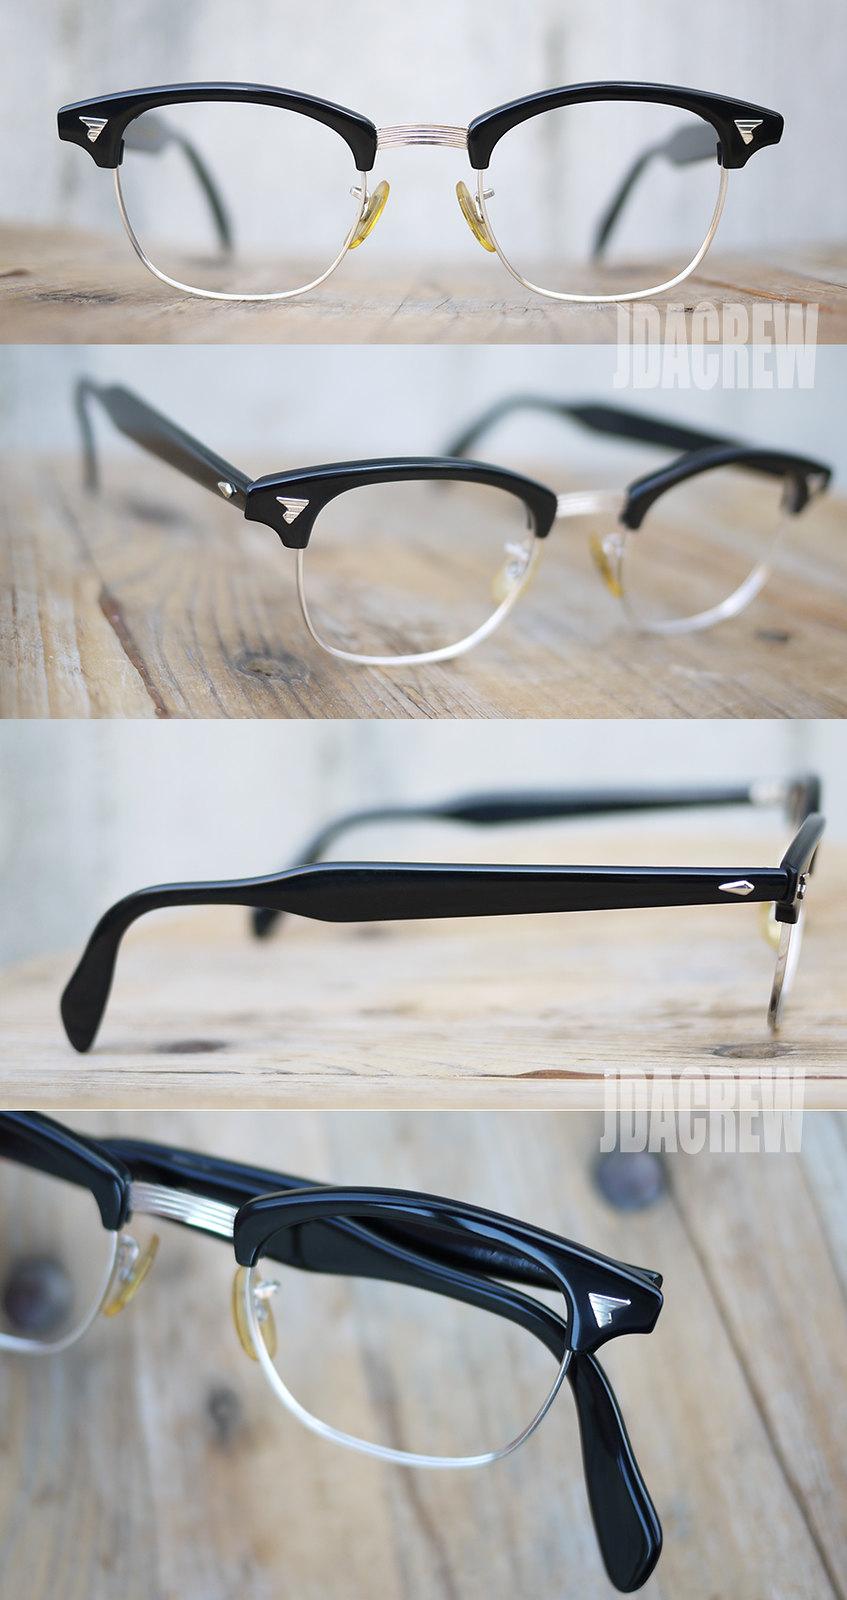 aoマルコムXアメリカンオプティカル眼鏡ビンテージ